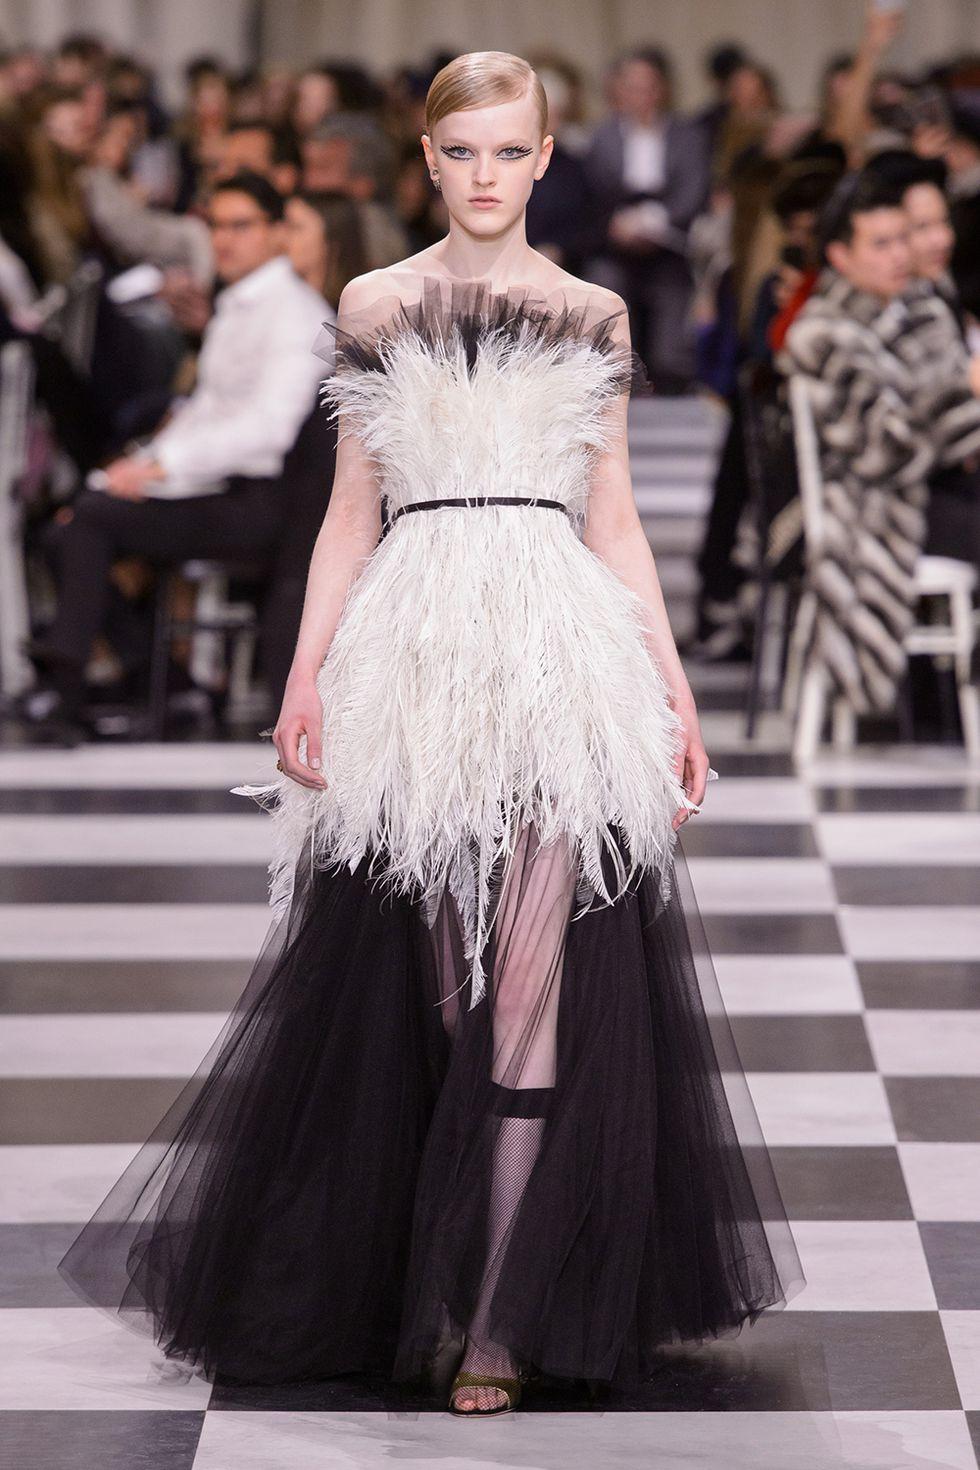 eac41f98dacbb Haute Couture Paris Fashion Week Spring 2018 - Christian Dior - Photo - Kim  Weston Arnold